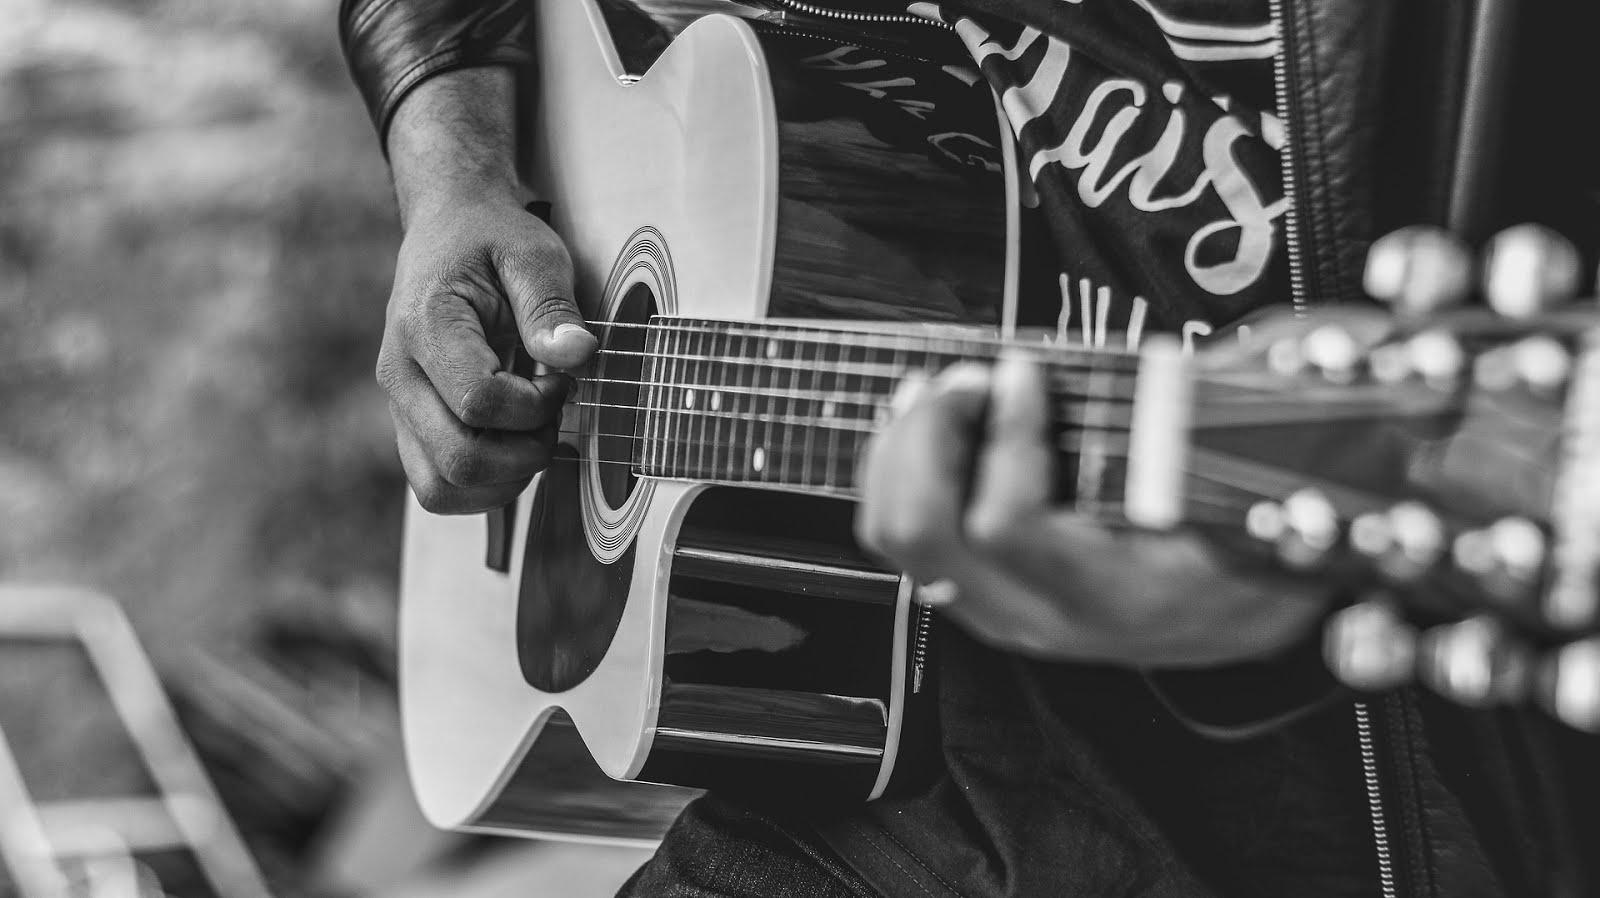 Gitaris, gitaris hebat, gitaris terbaik, www.slashkygitaris.com, slashky gitaris